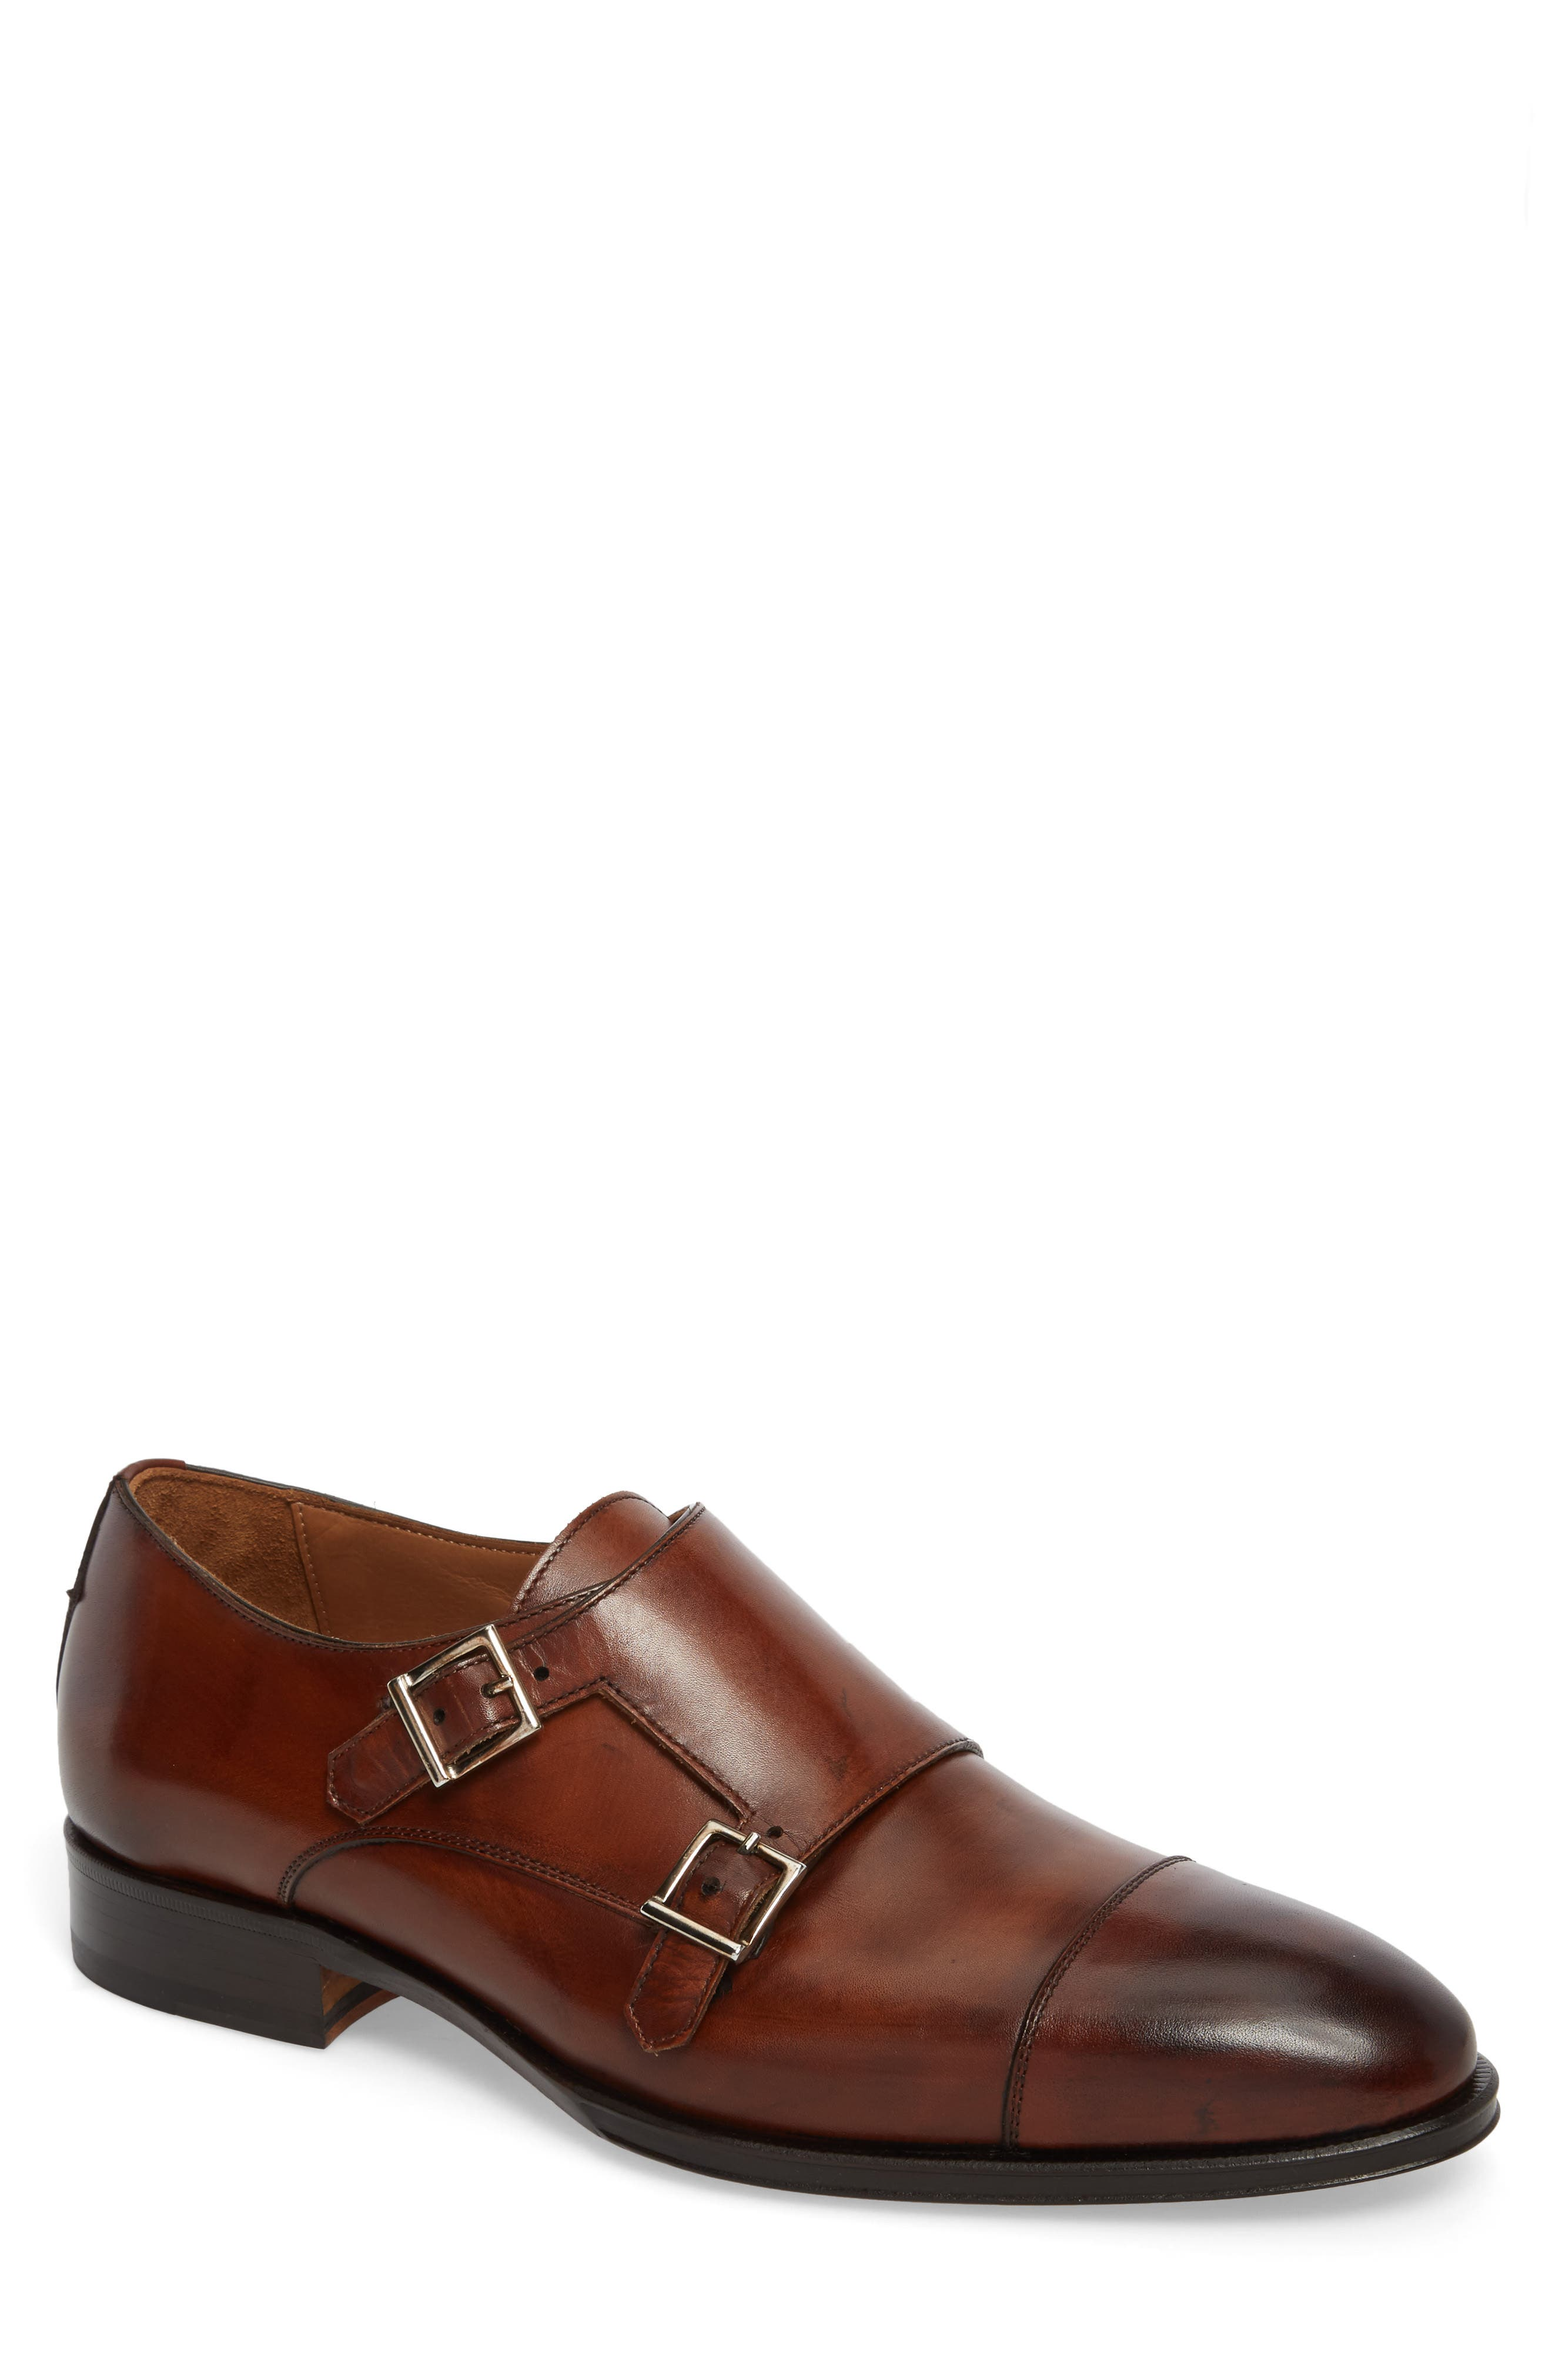 Gallo Bianco Double Monk Strap Shoe,                             Main thumbnail 1, color,                             201